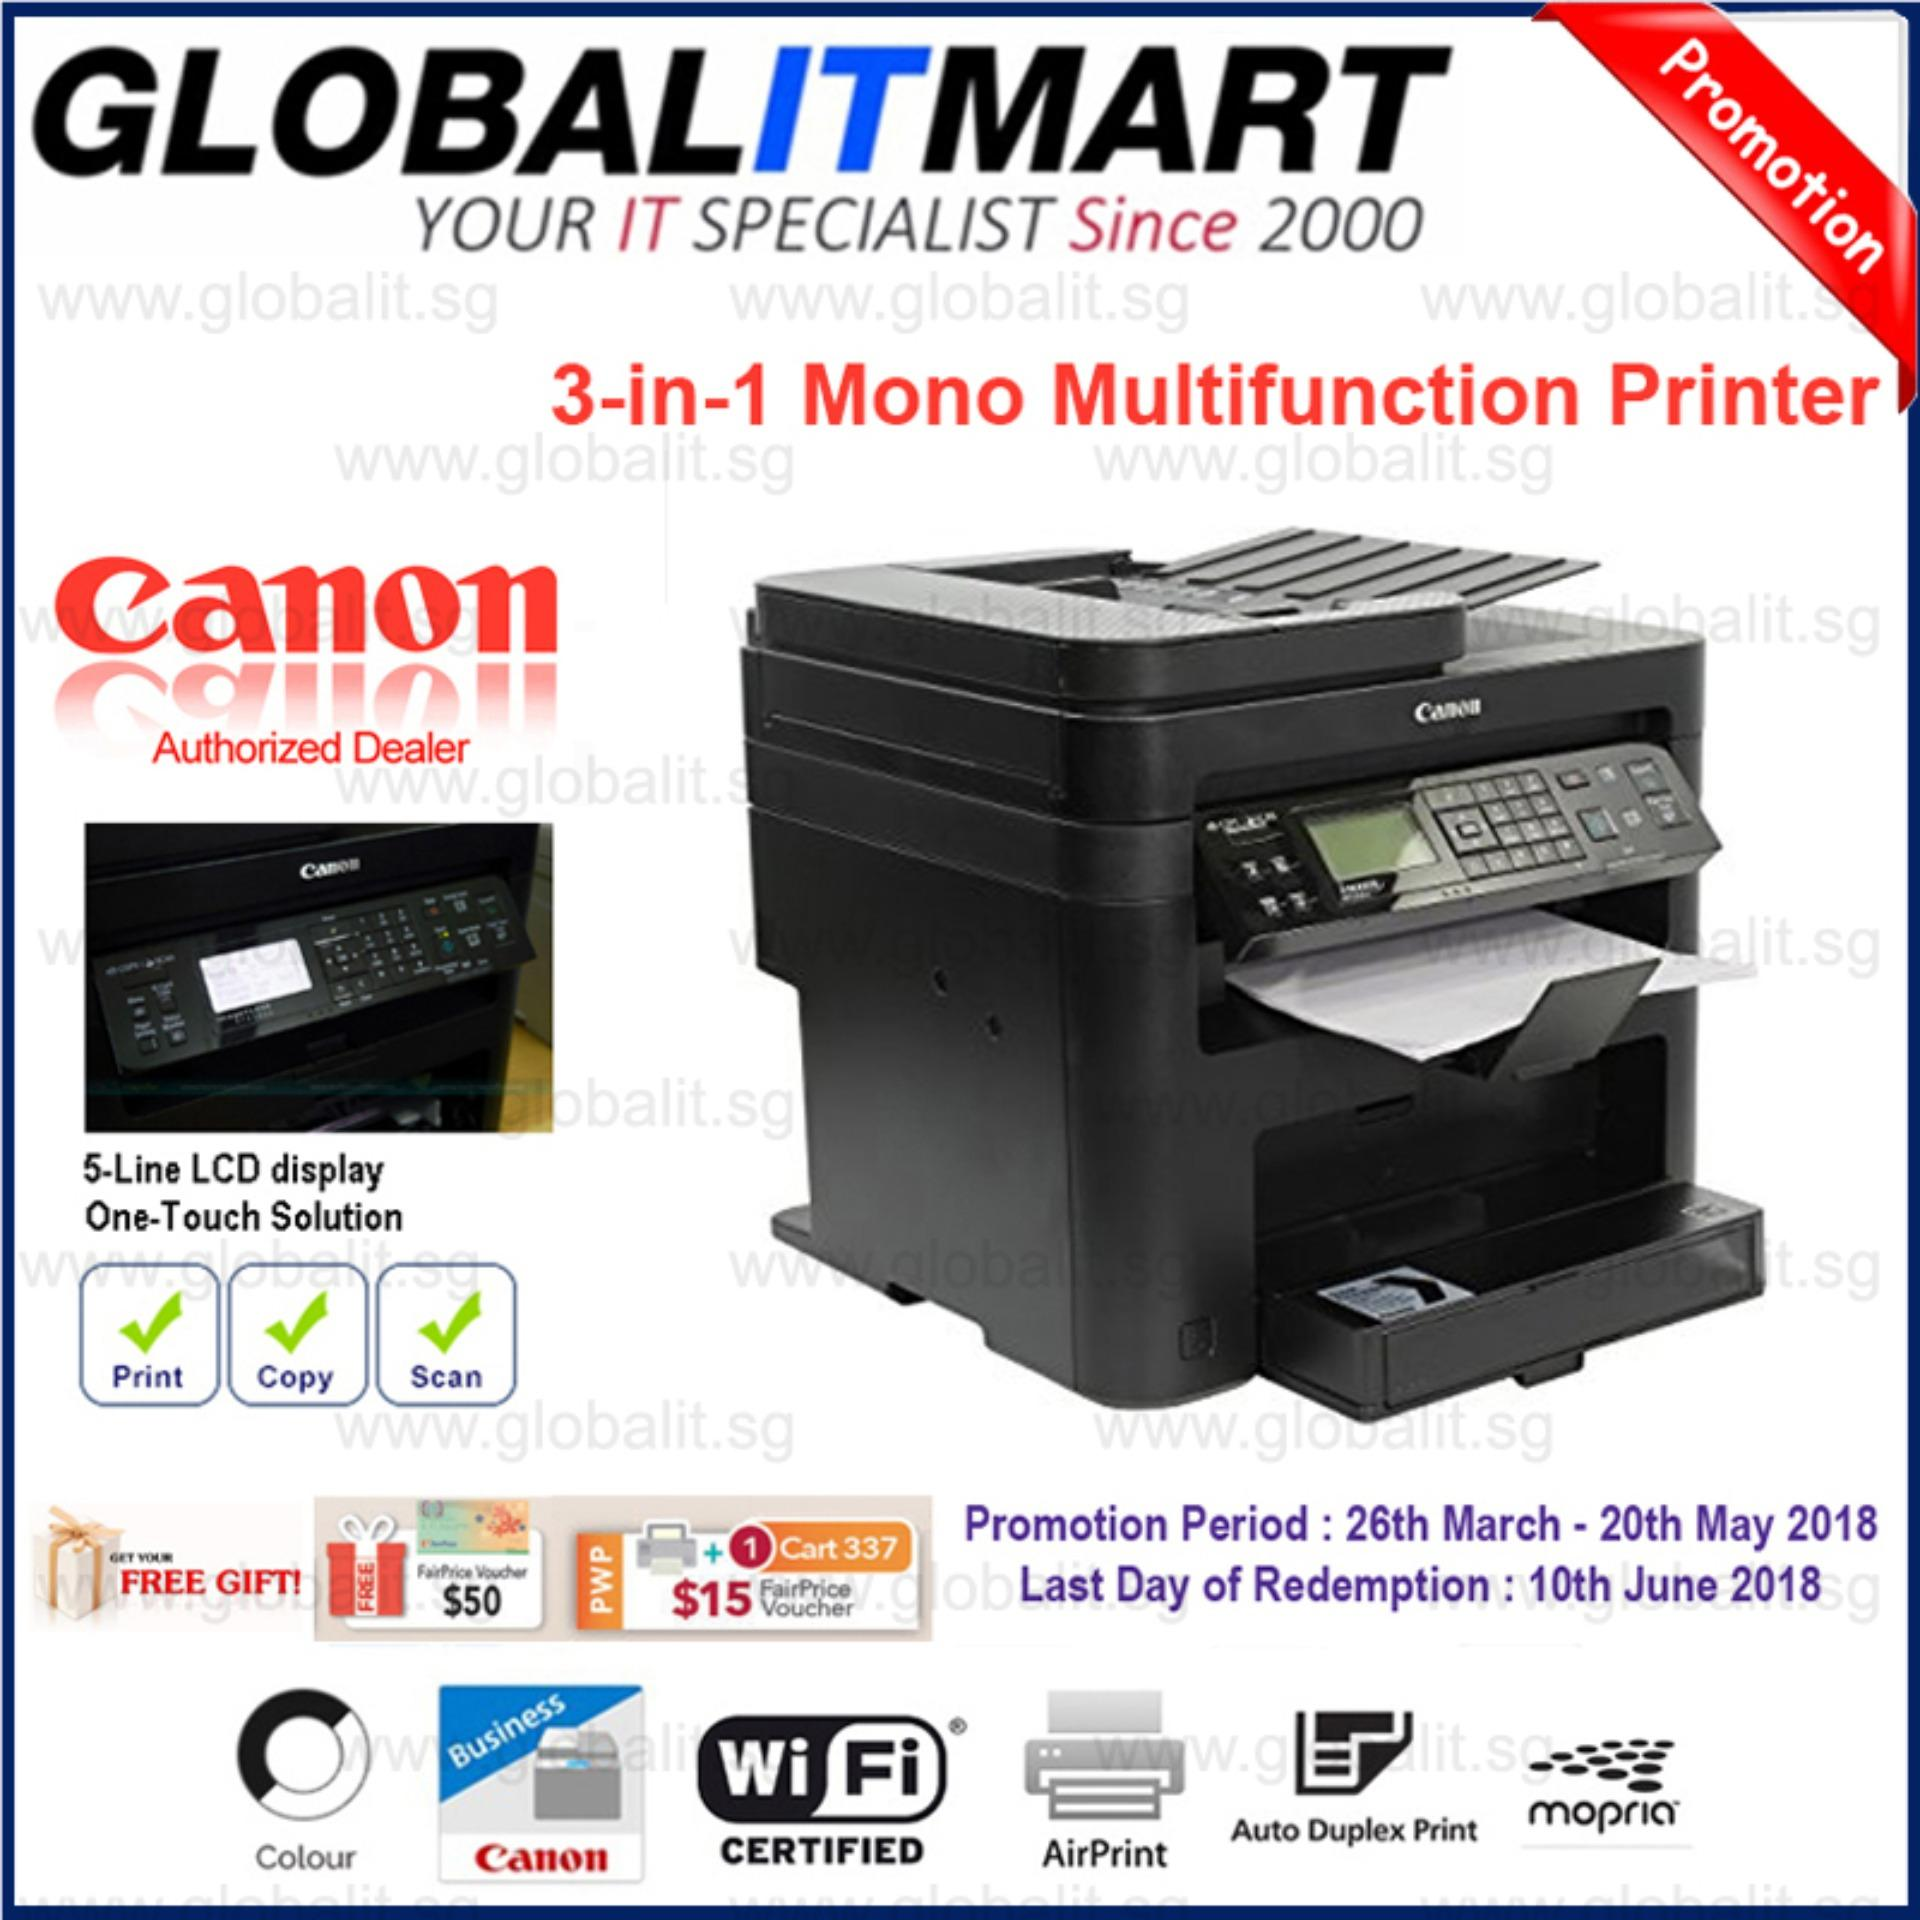 CANON imageCLASS MF244dw 3-in-1 Mono Multifunction Printer Singapore